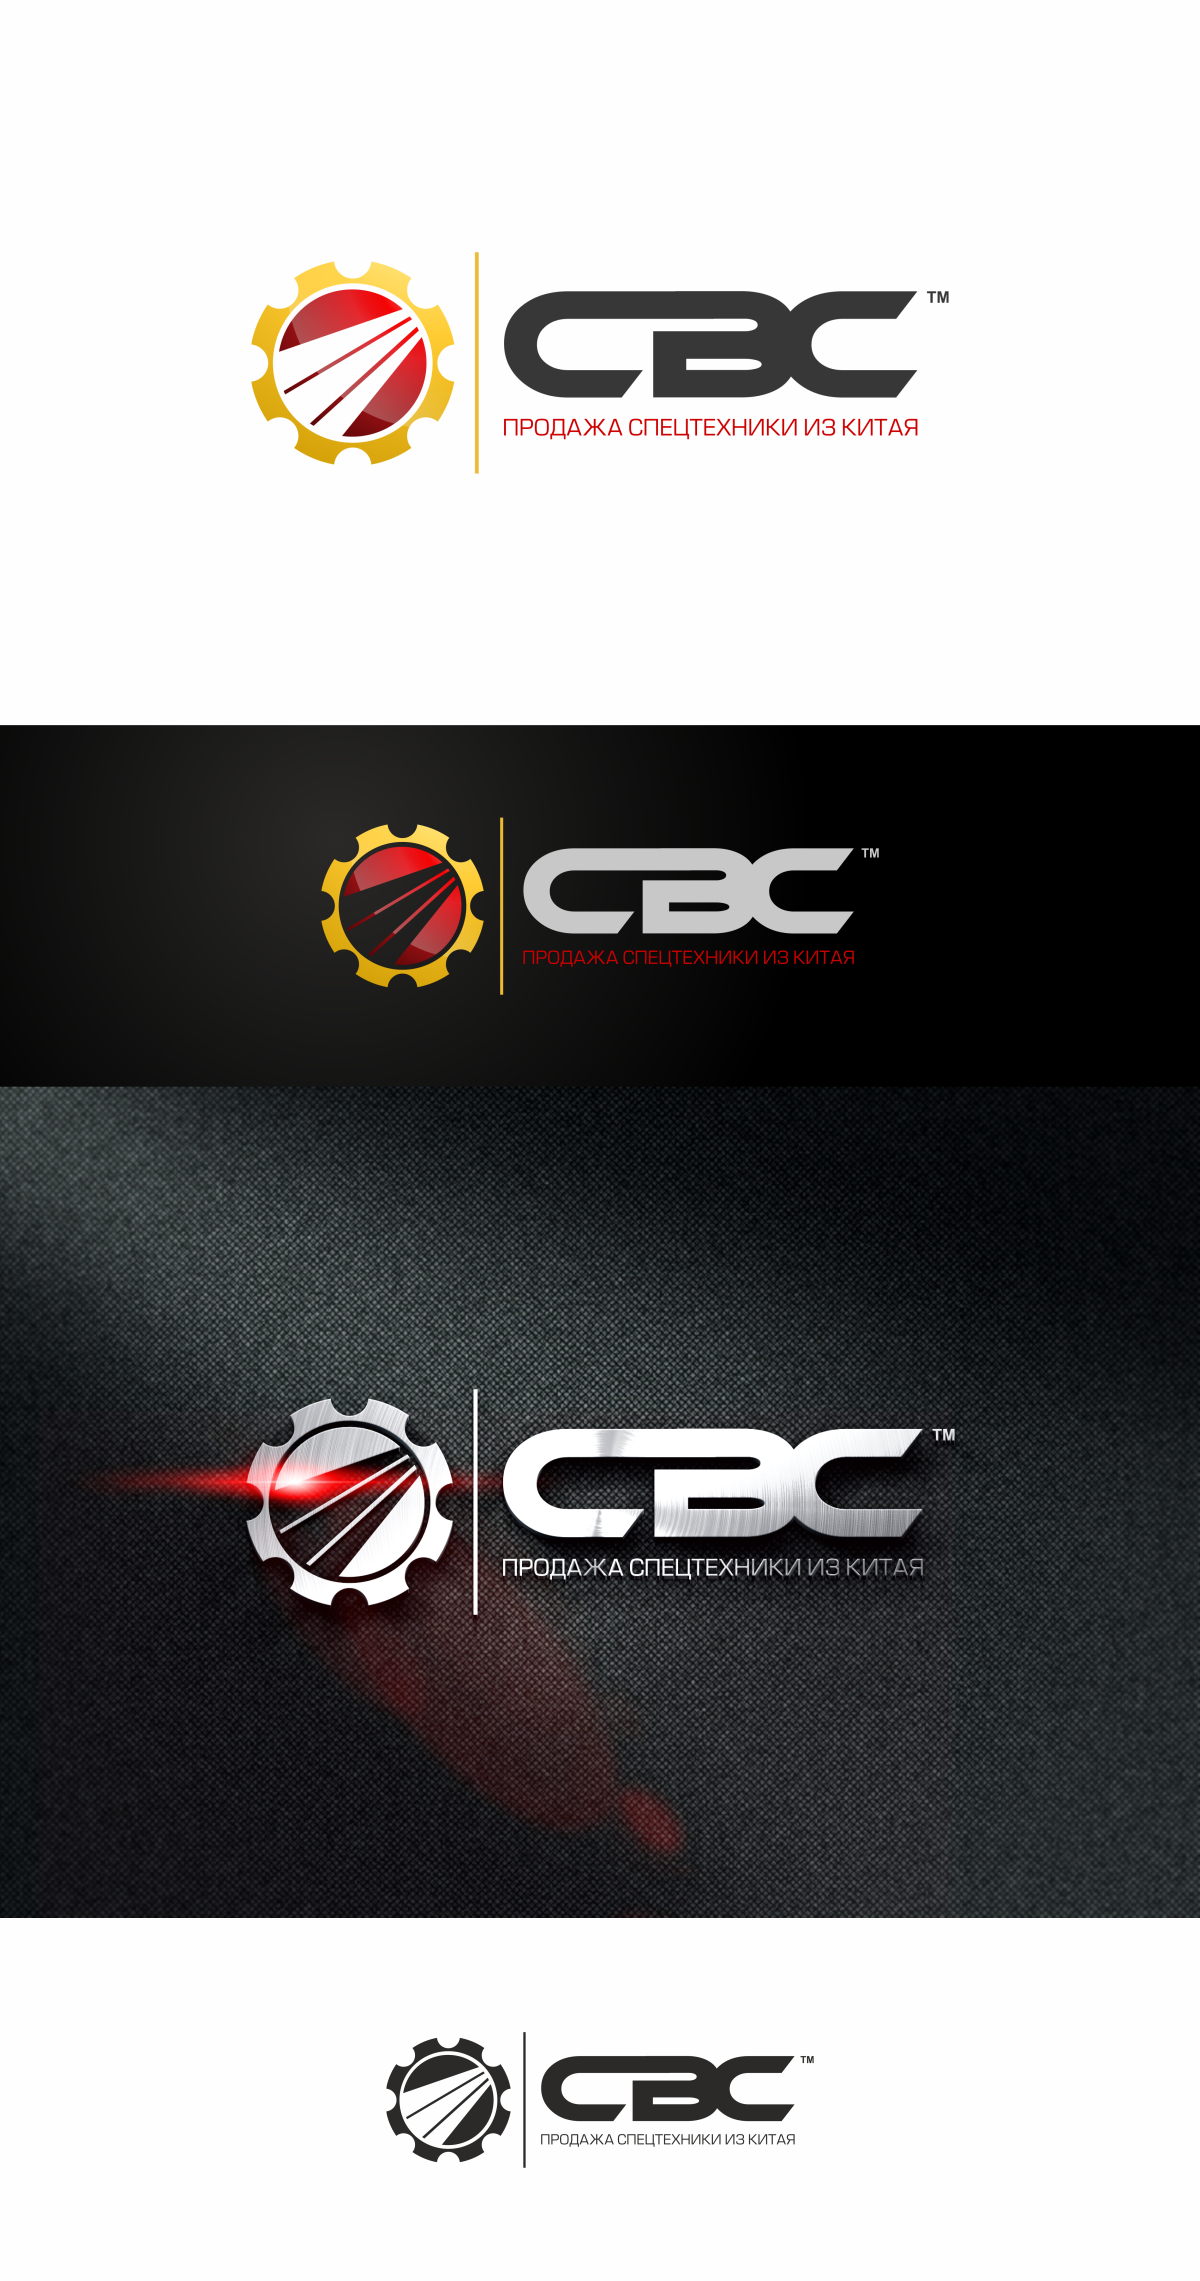 Логотип +  слоган фото f_847544e6a9db9b2b.jpg